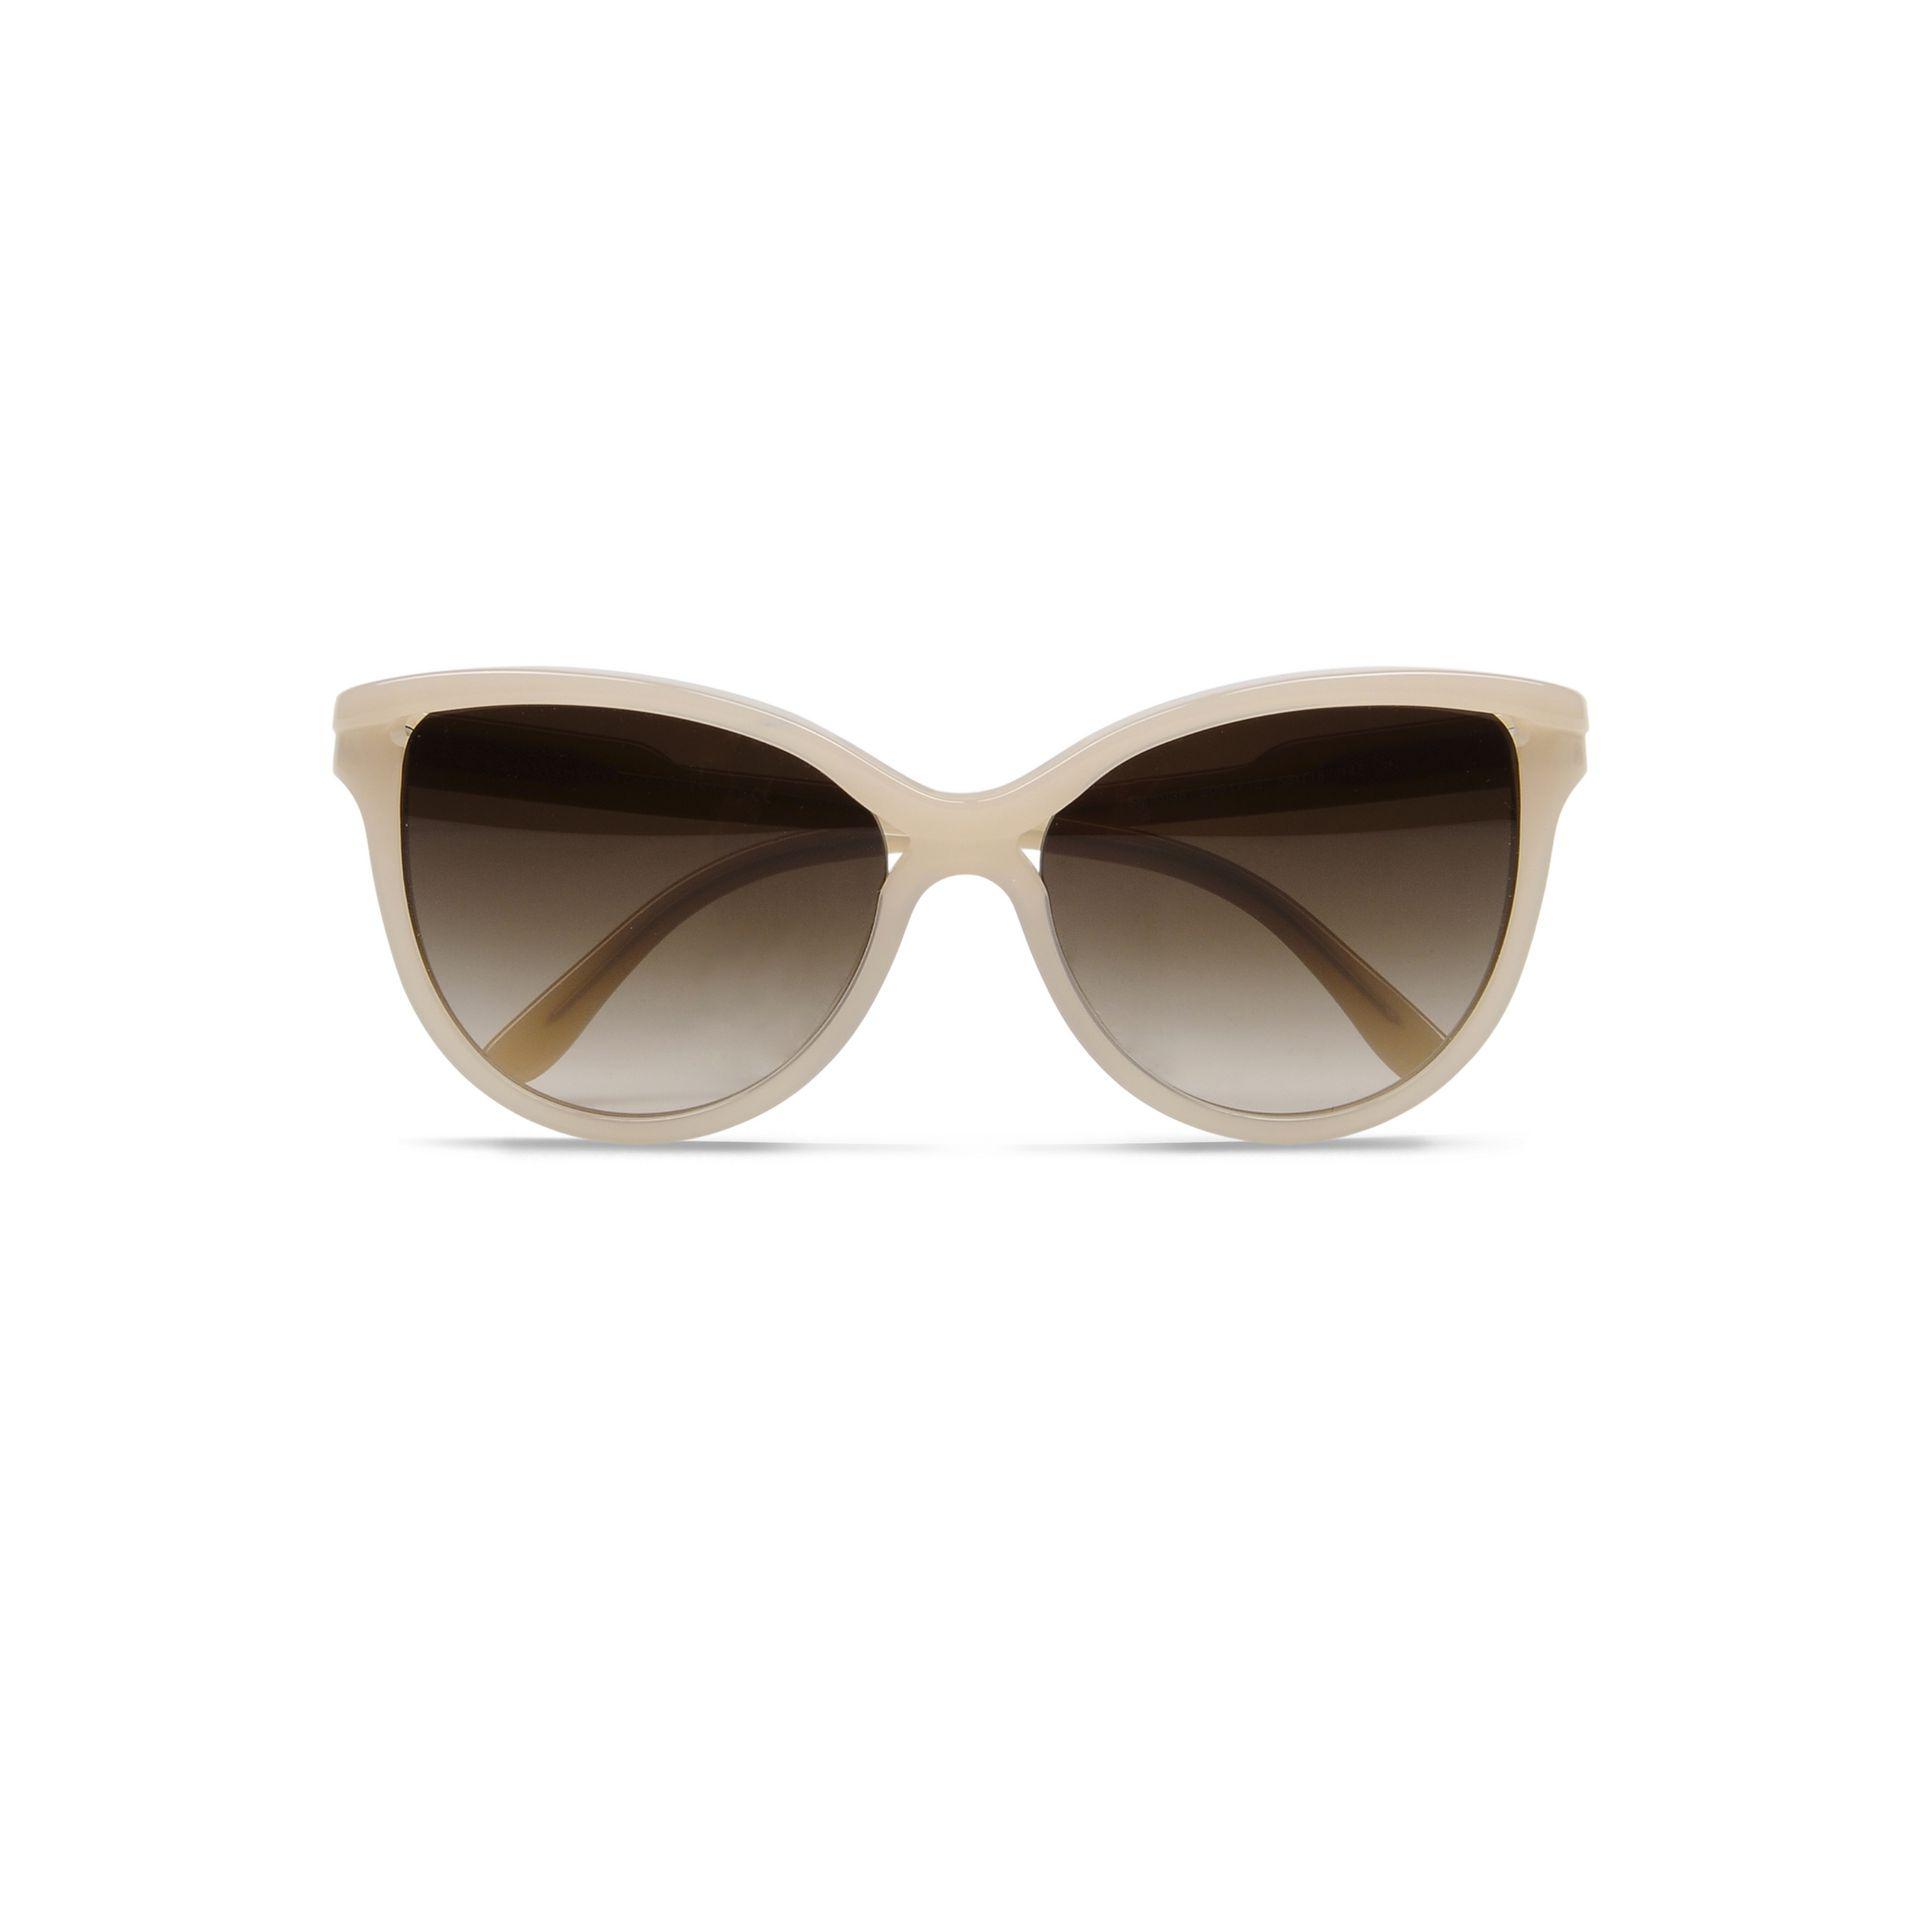 Stella mccartney Cat Eye Sunglasses in Gray (Nude) | Lyst